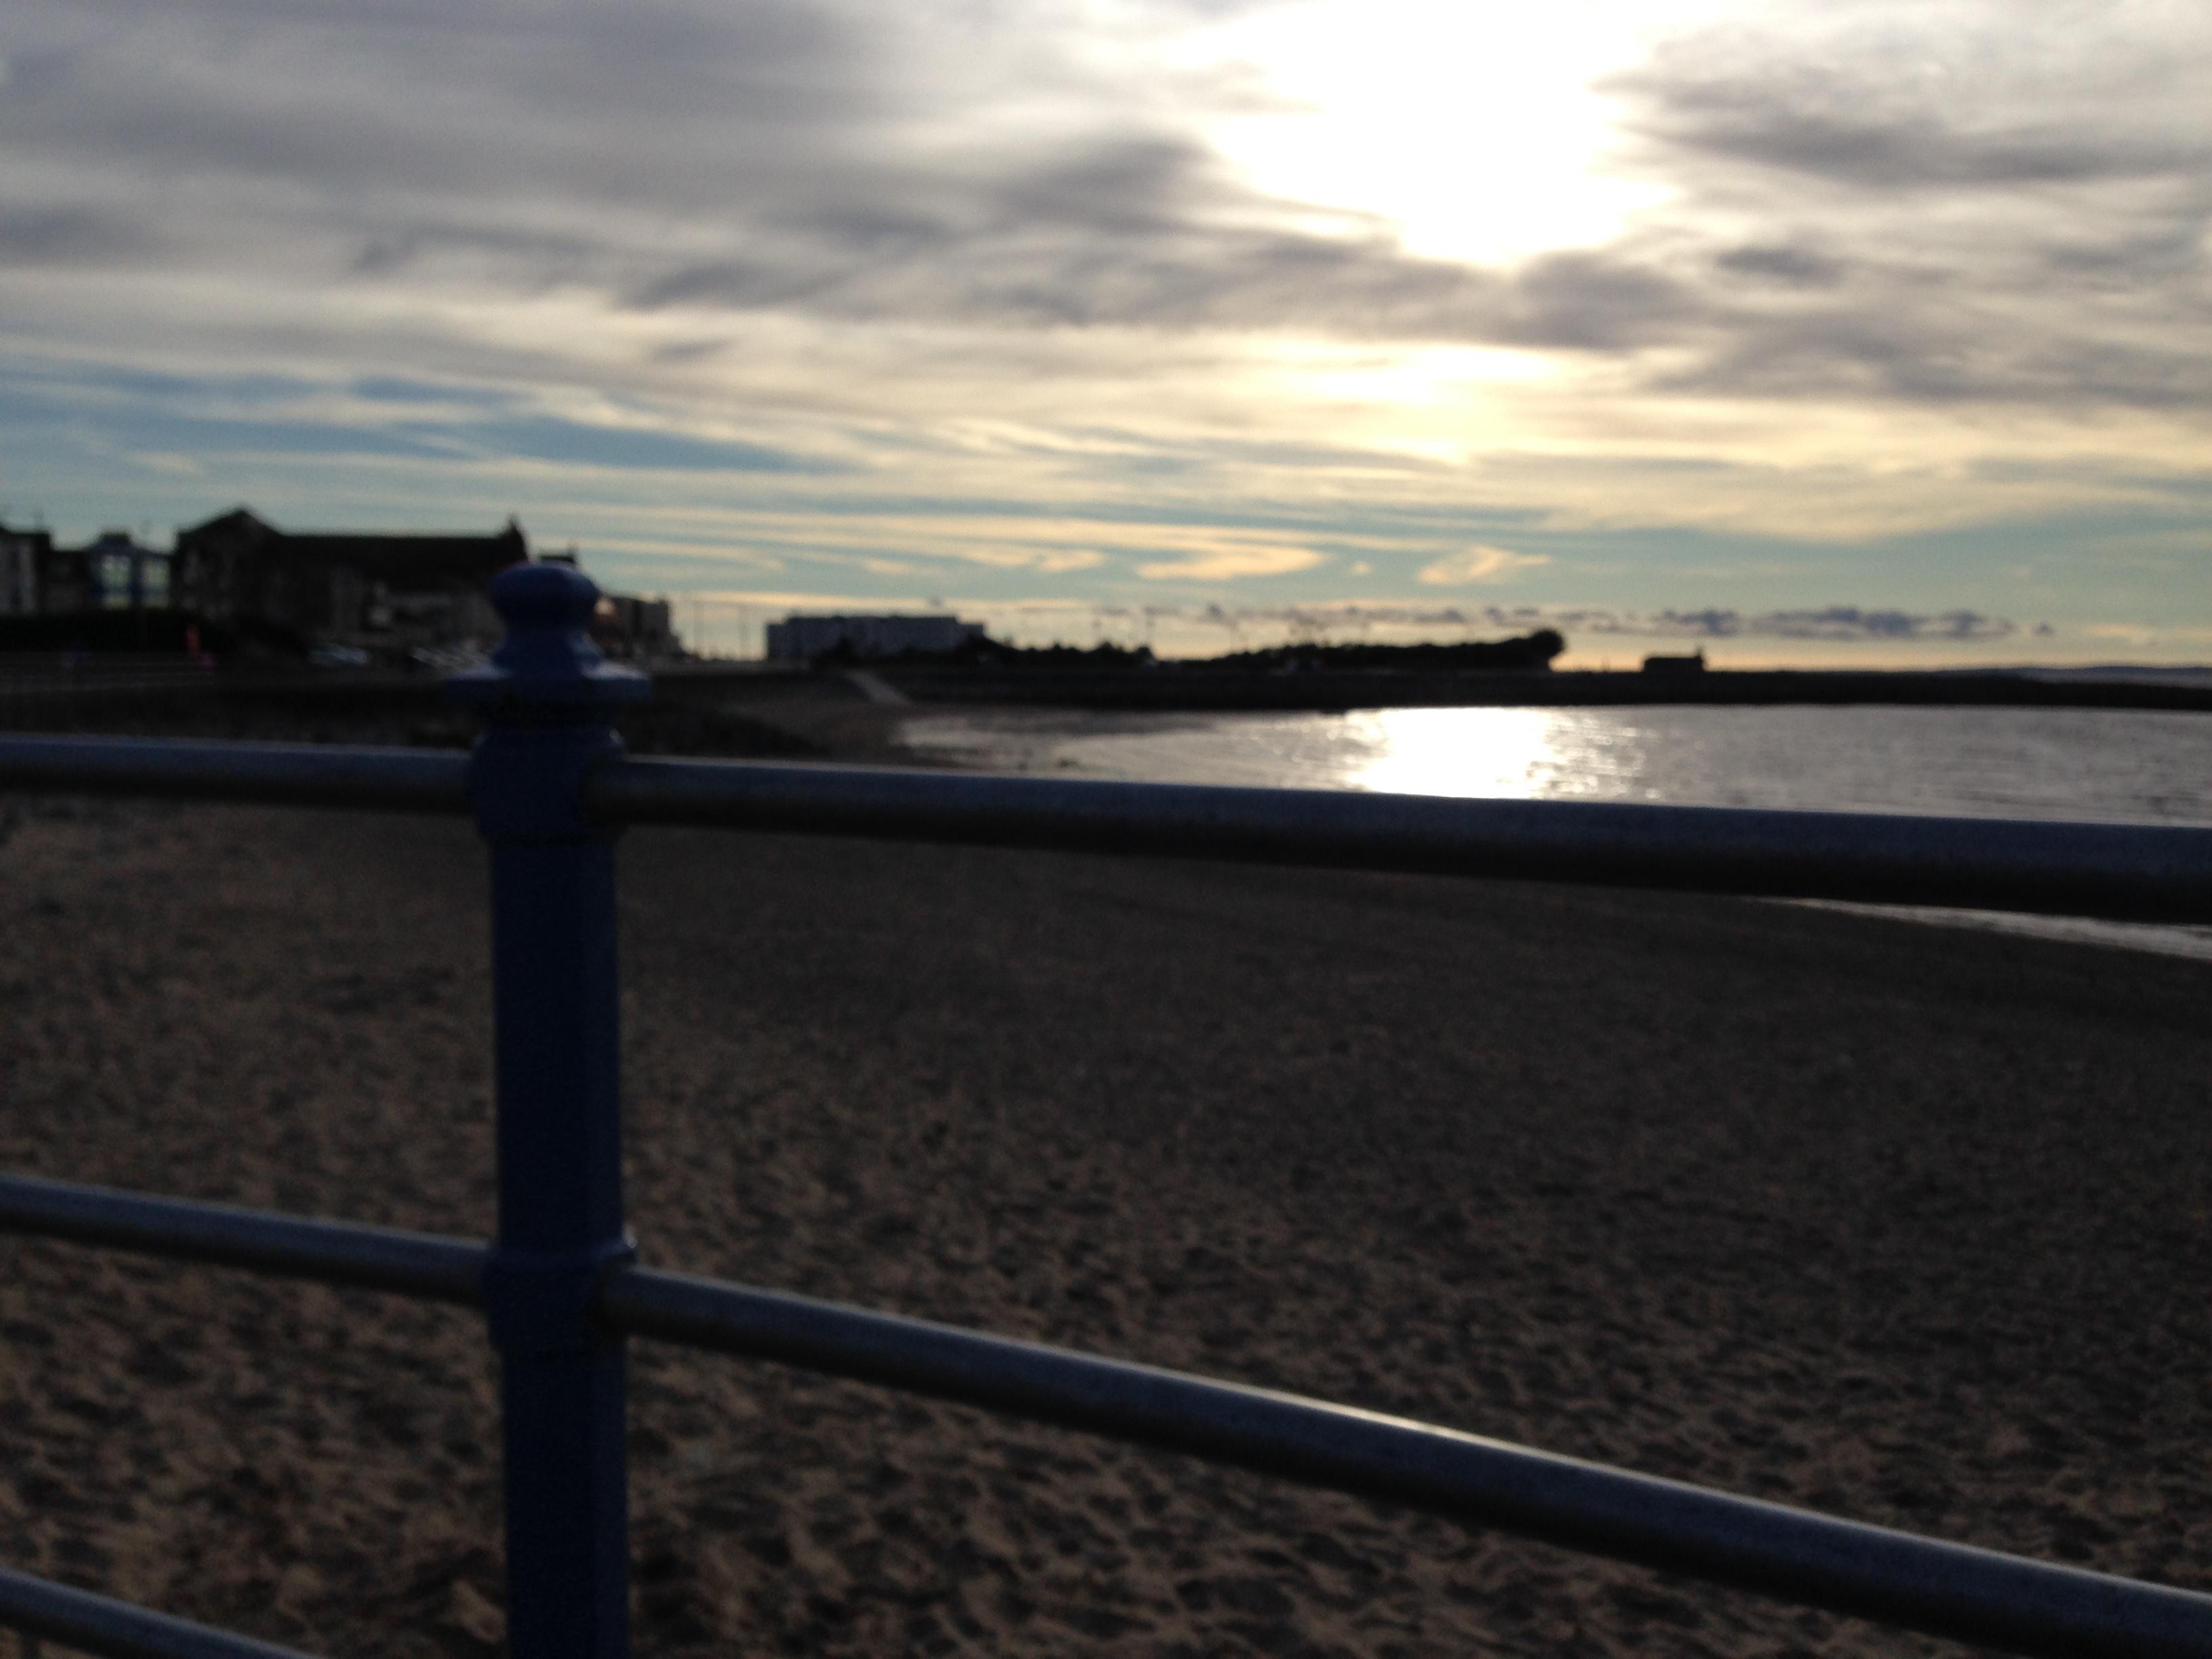 Sunset at Peel